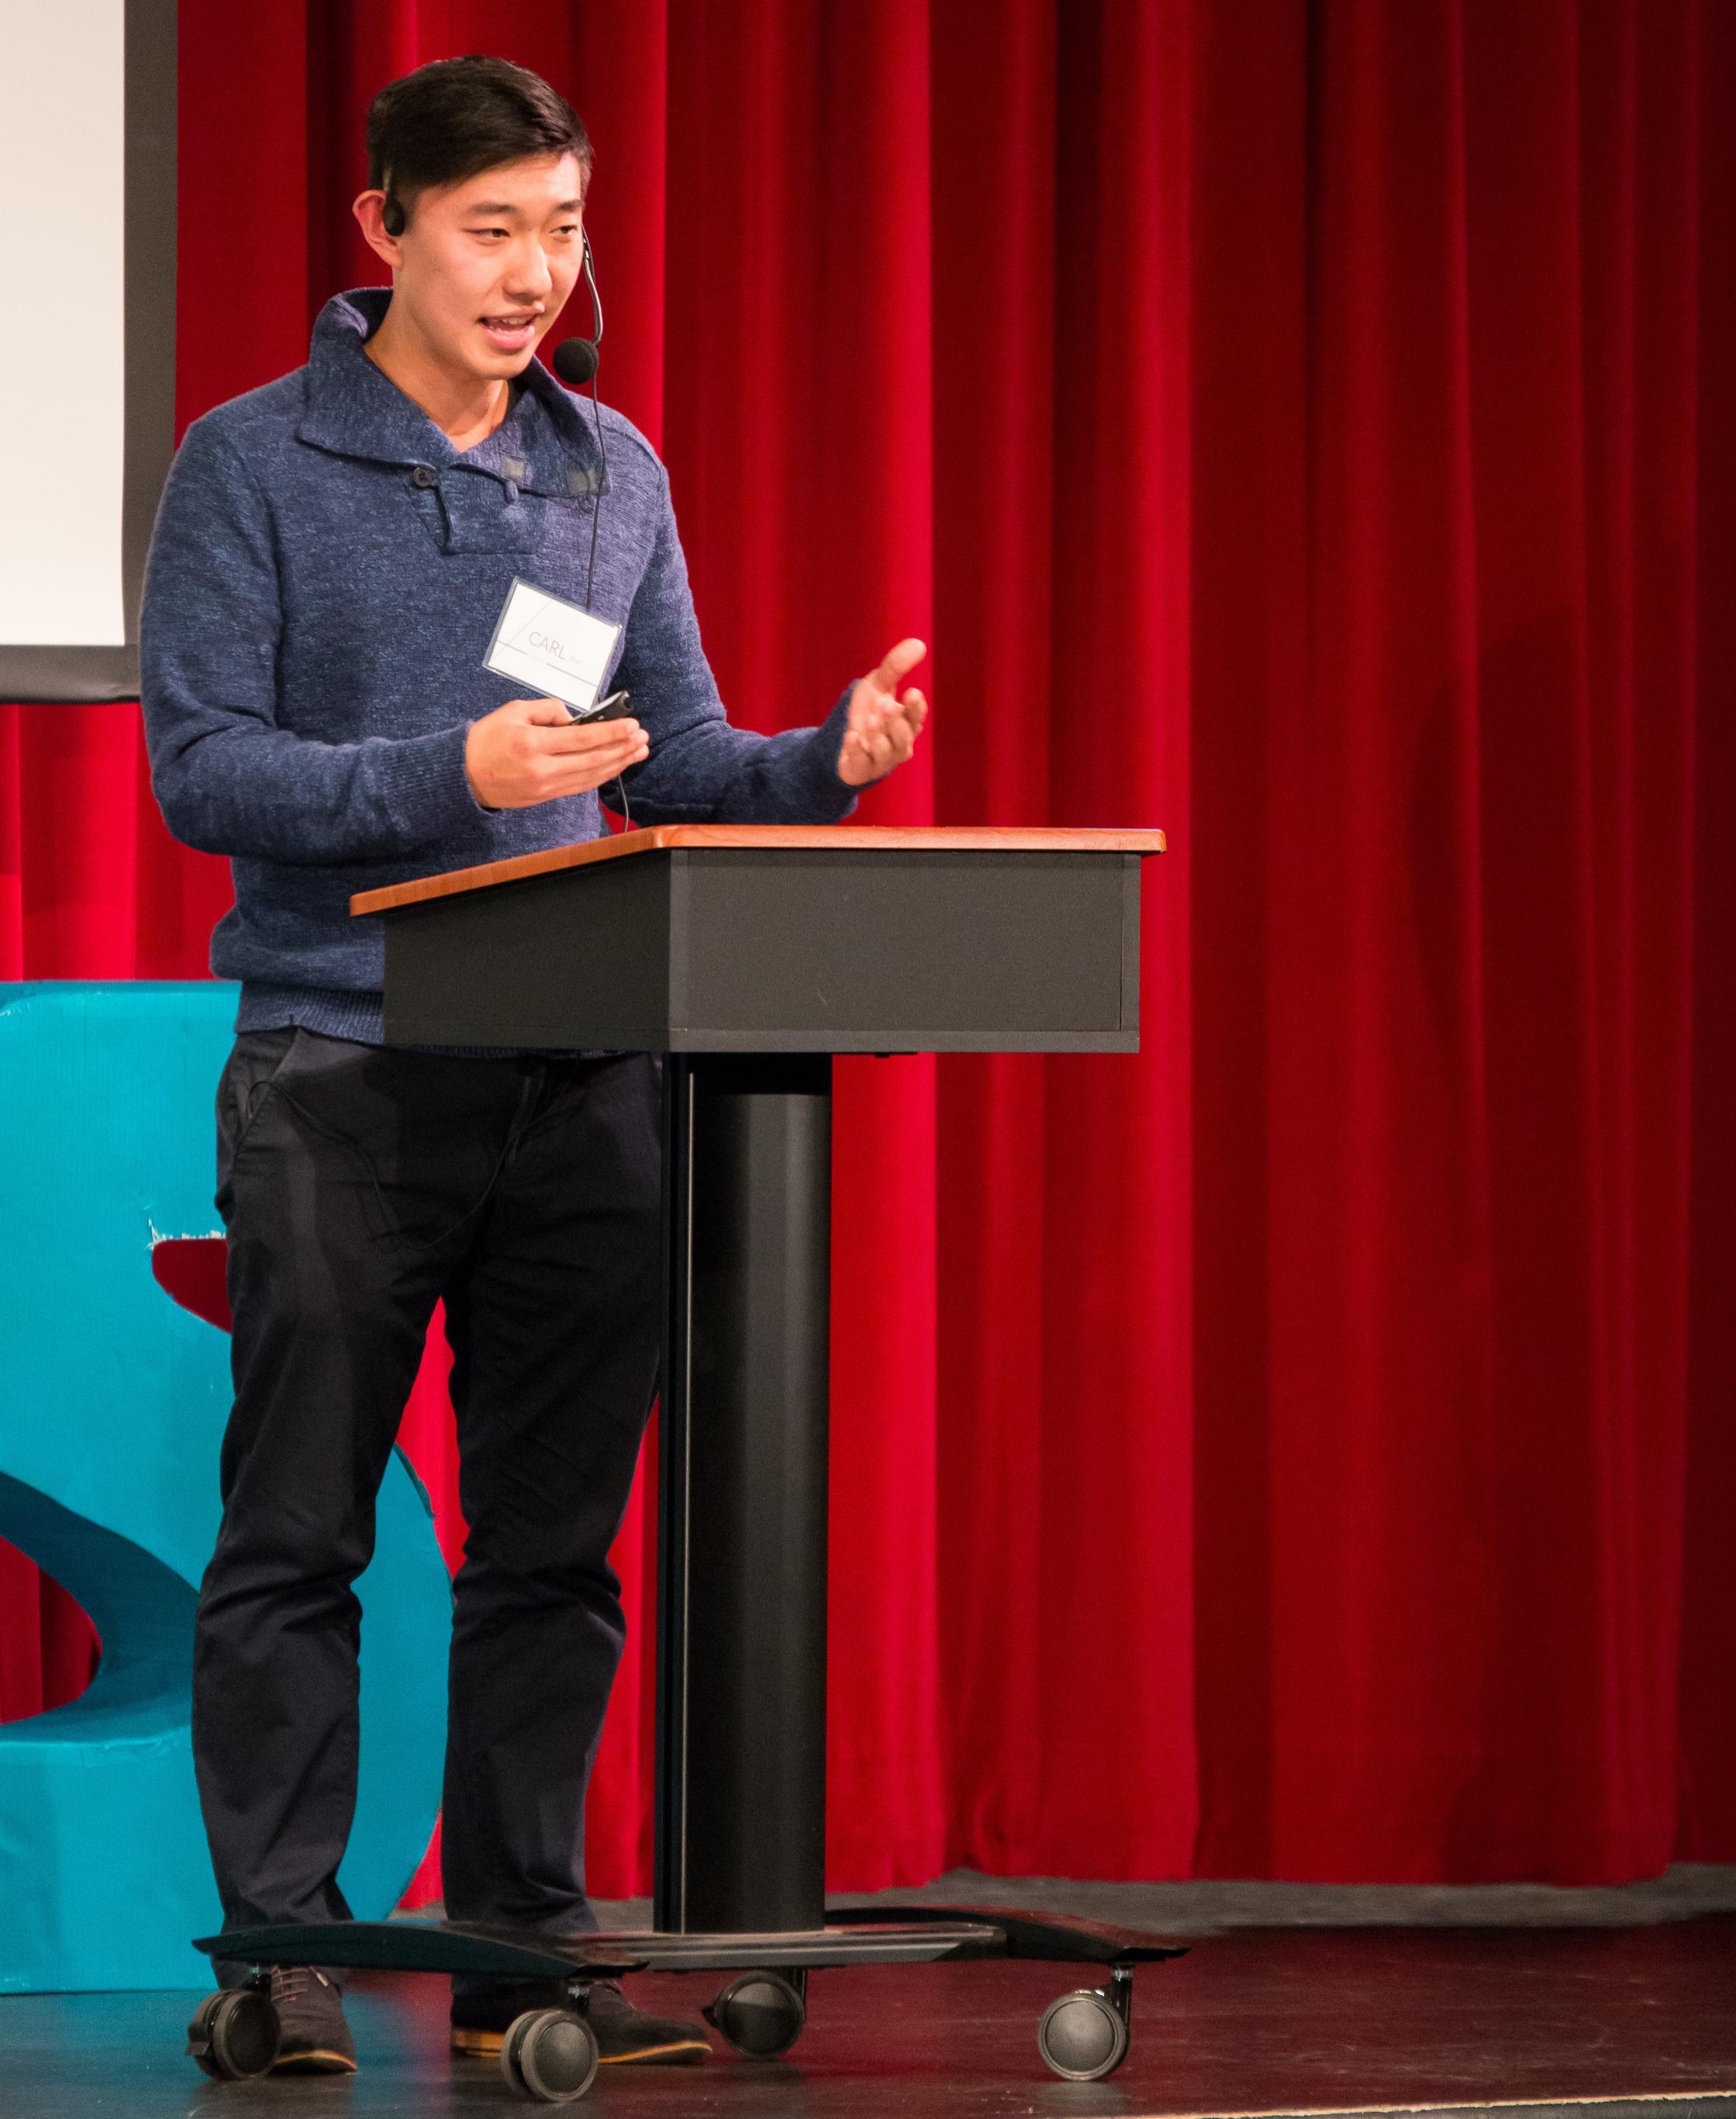 Giving a talk at lynbrook high school, 2016